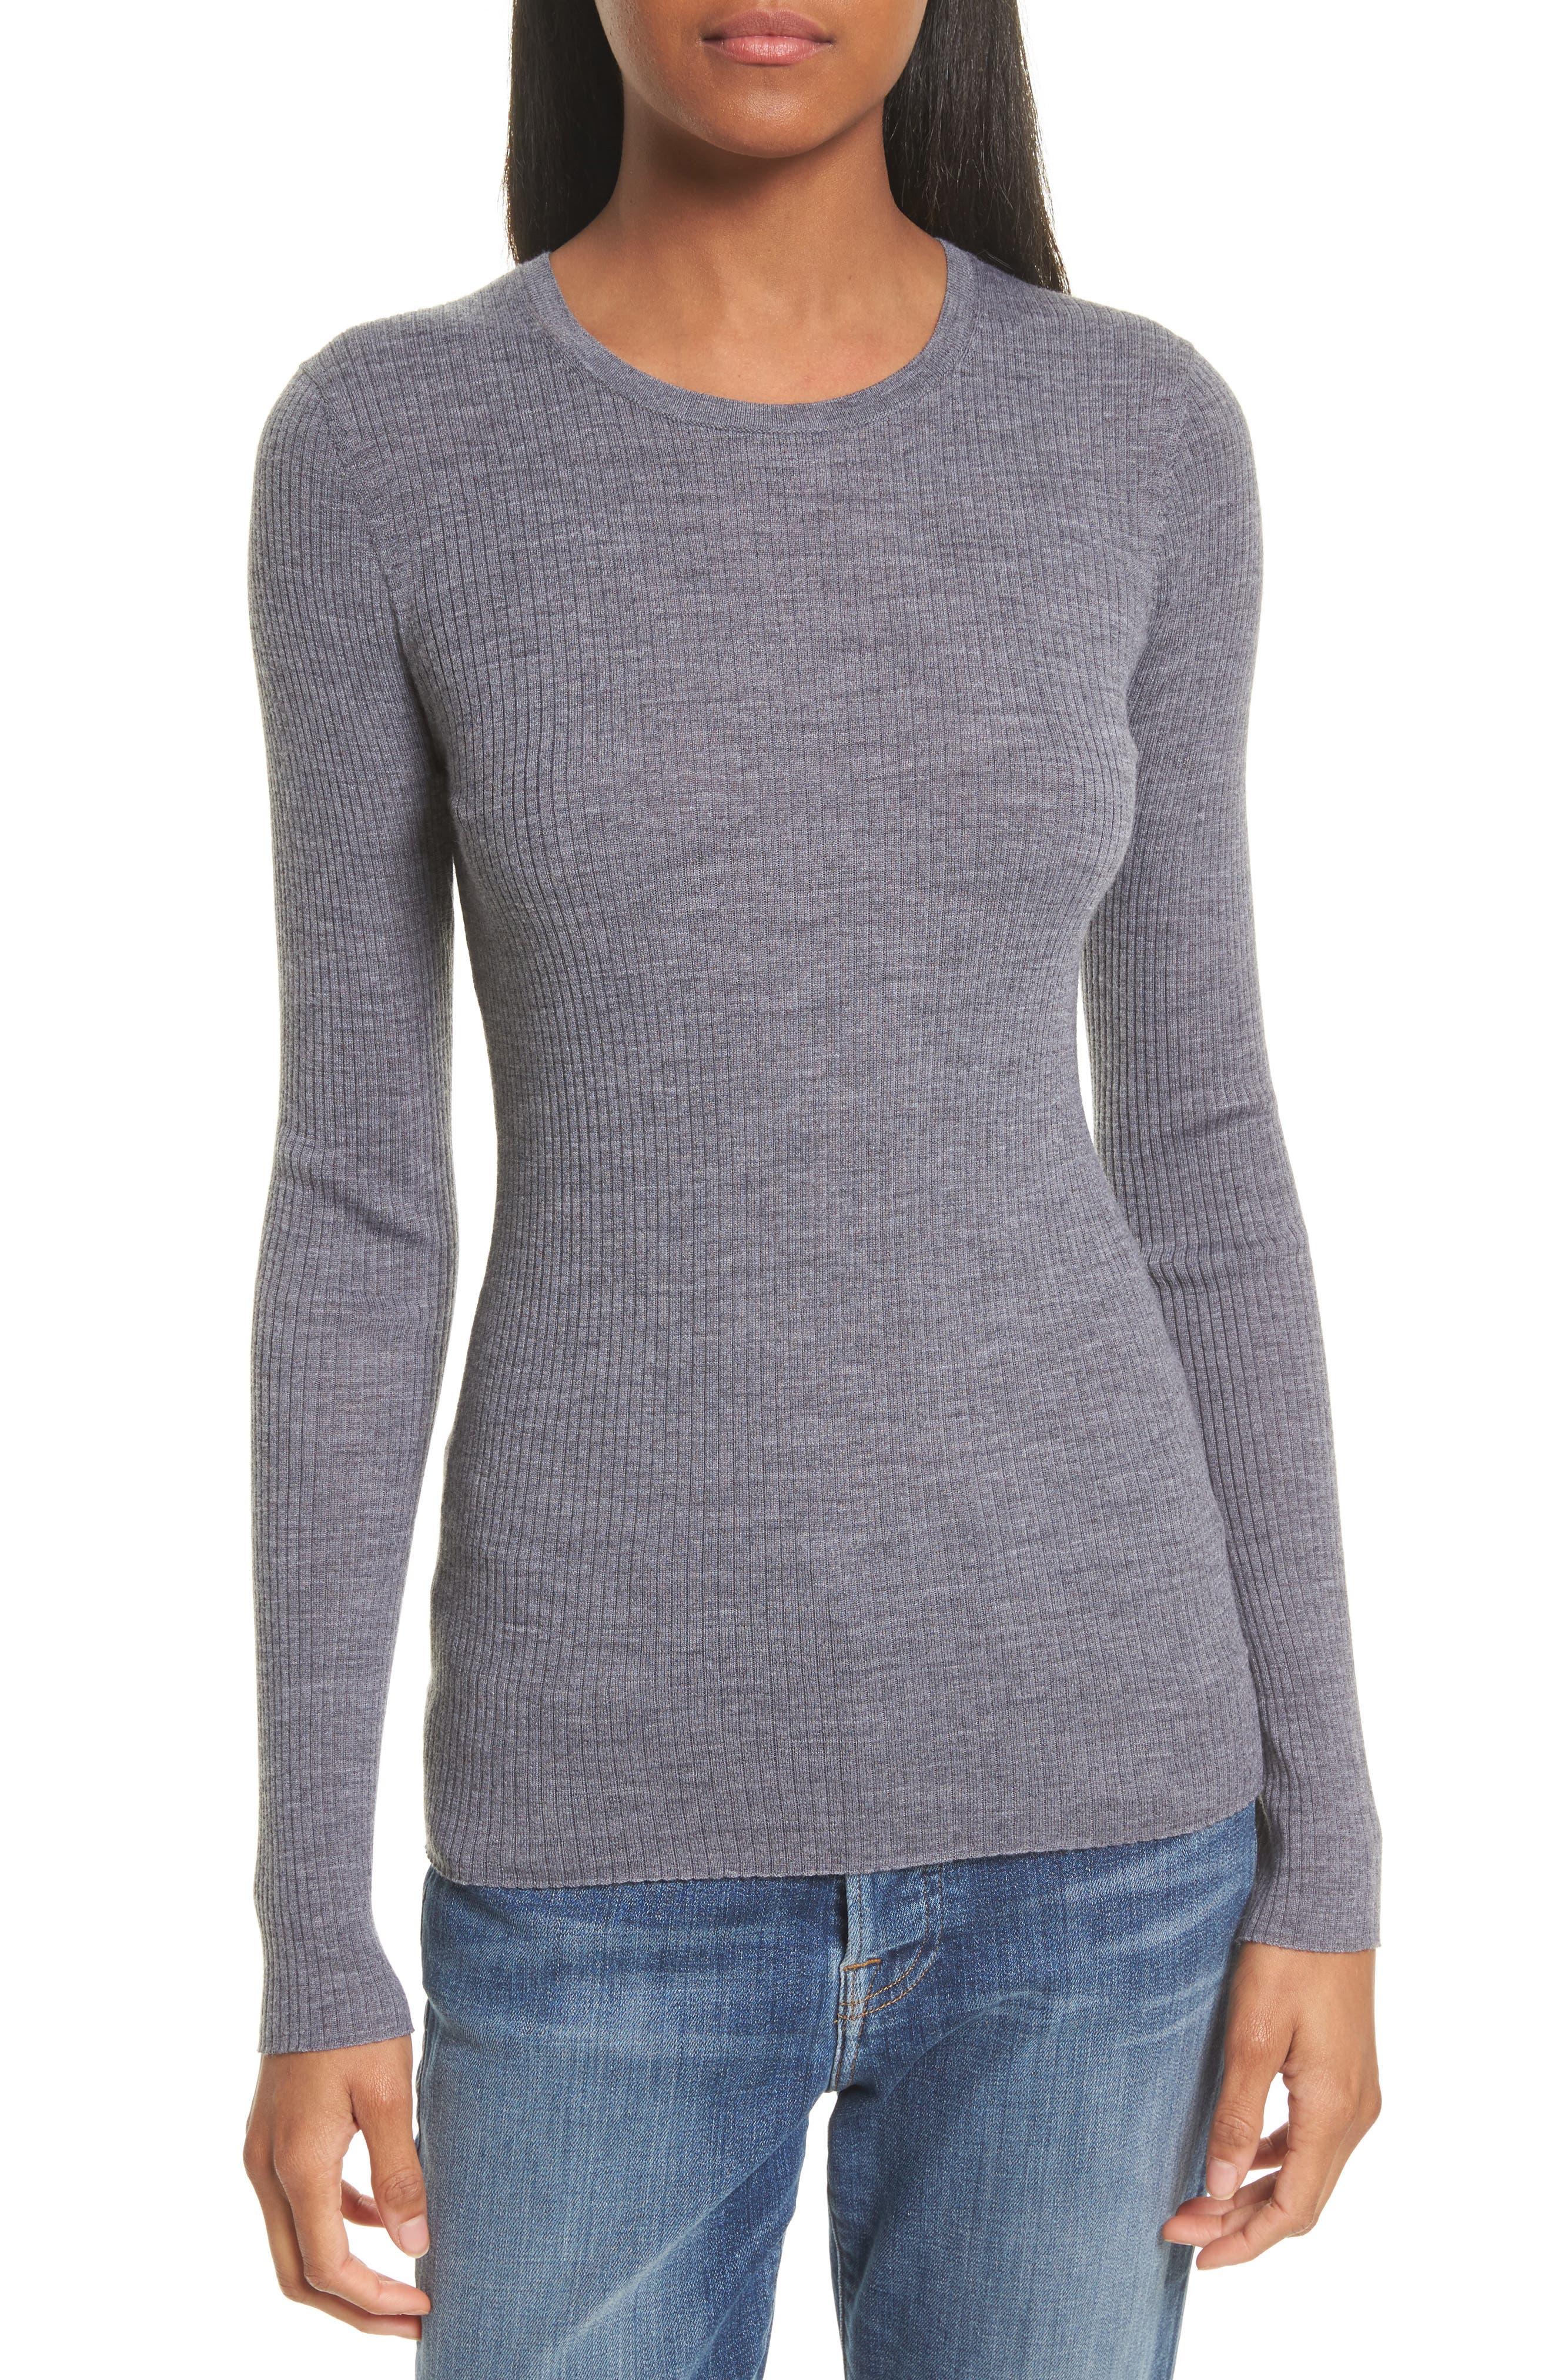 Mirzi B Merino Wool Sweater,                             Main thumbnail 1, color,                             059